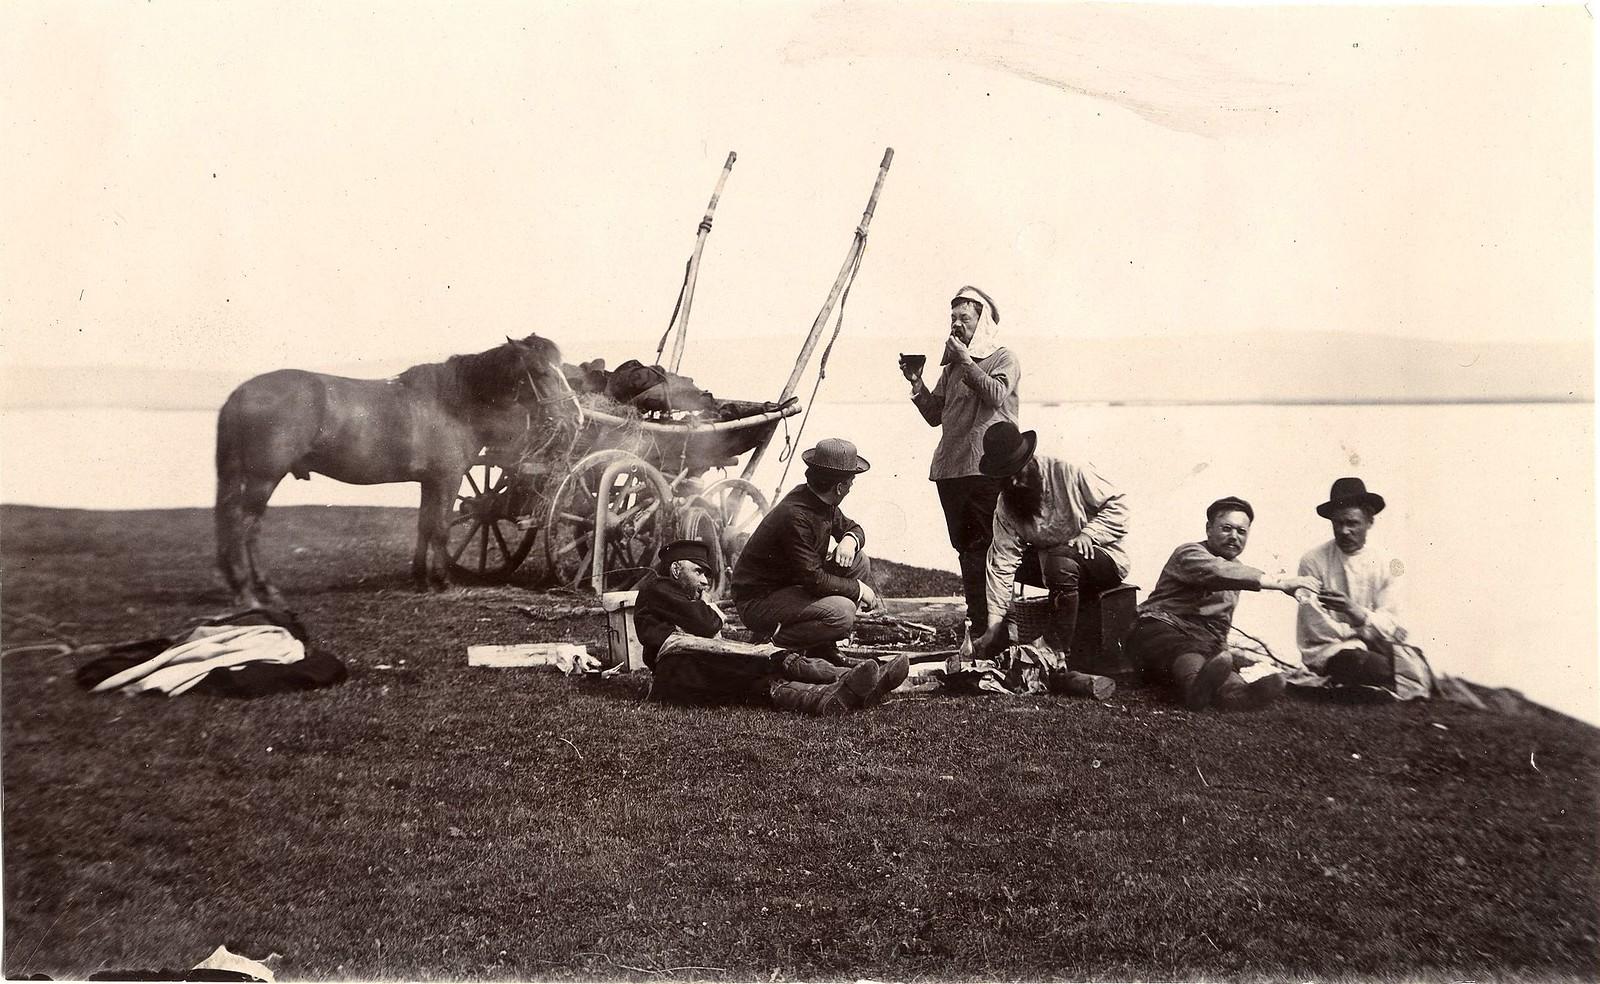 06. На пикнике. Группа мужчин на берегу реки